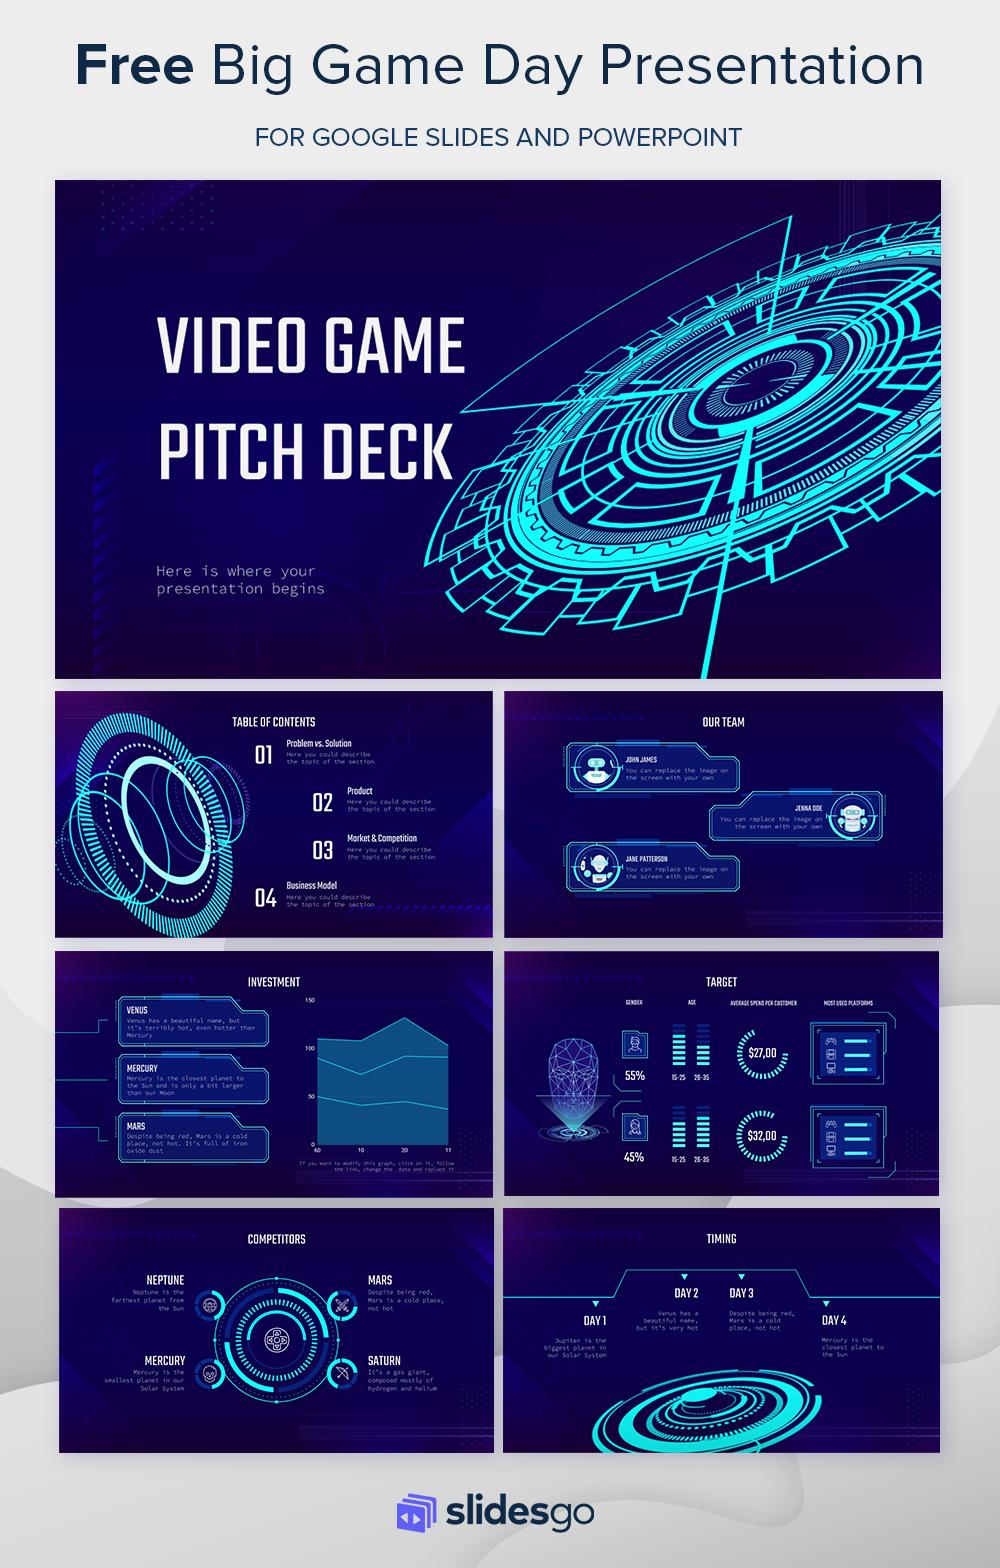 Video Game Pitch Deck Presentation Pitch Presentation Creative Powerpoint Templates Presentation Design Layout